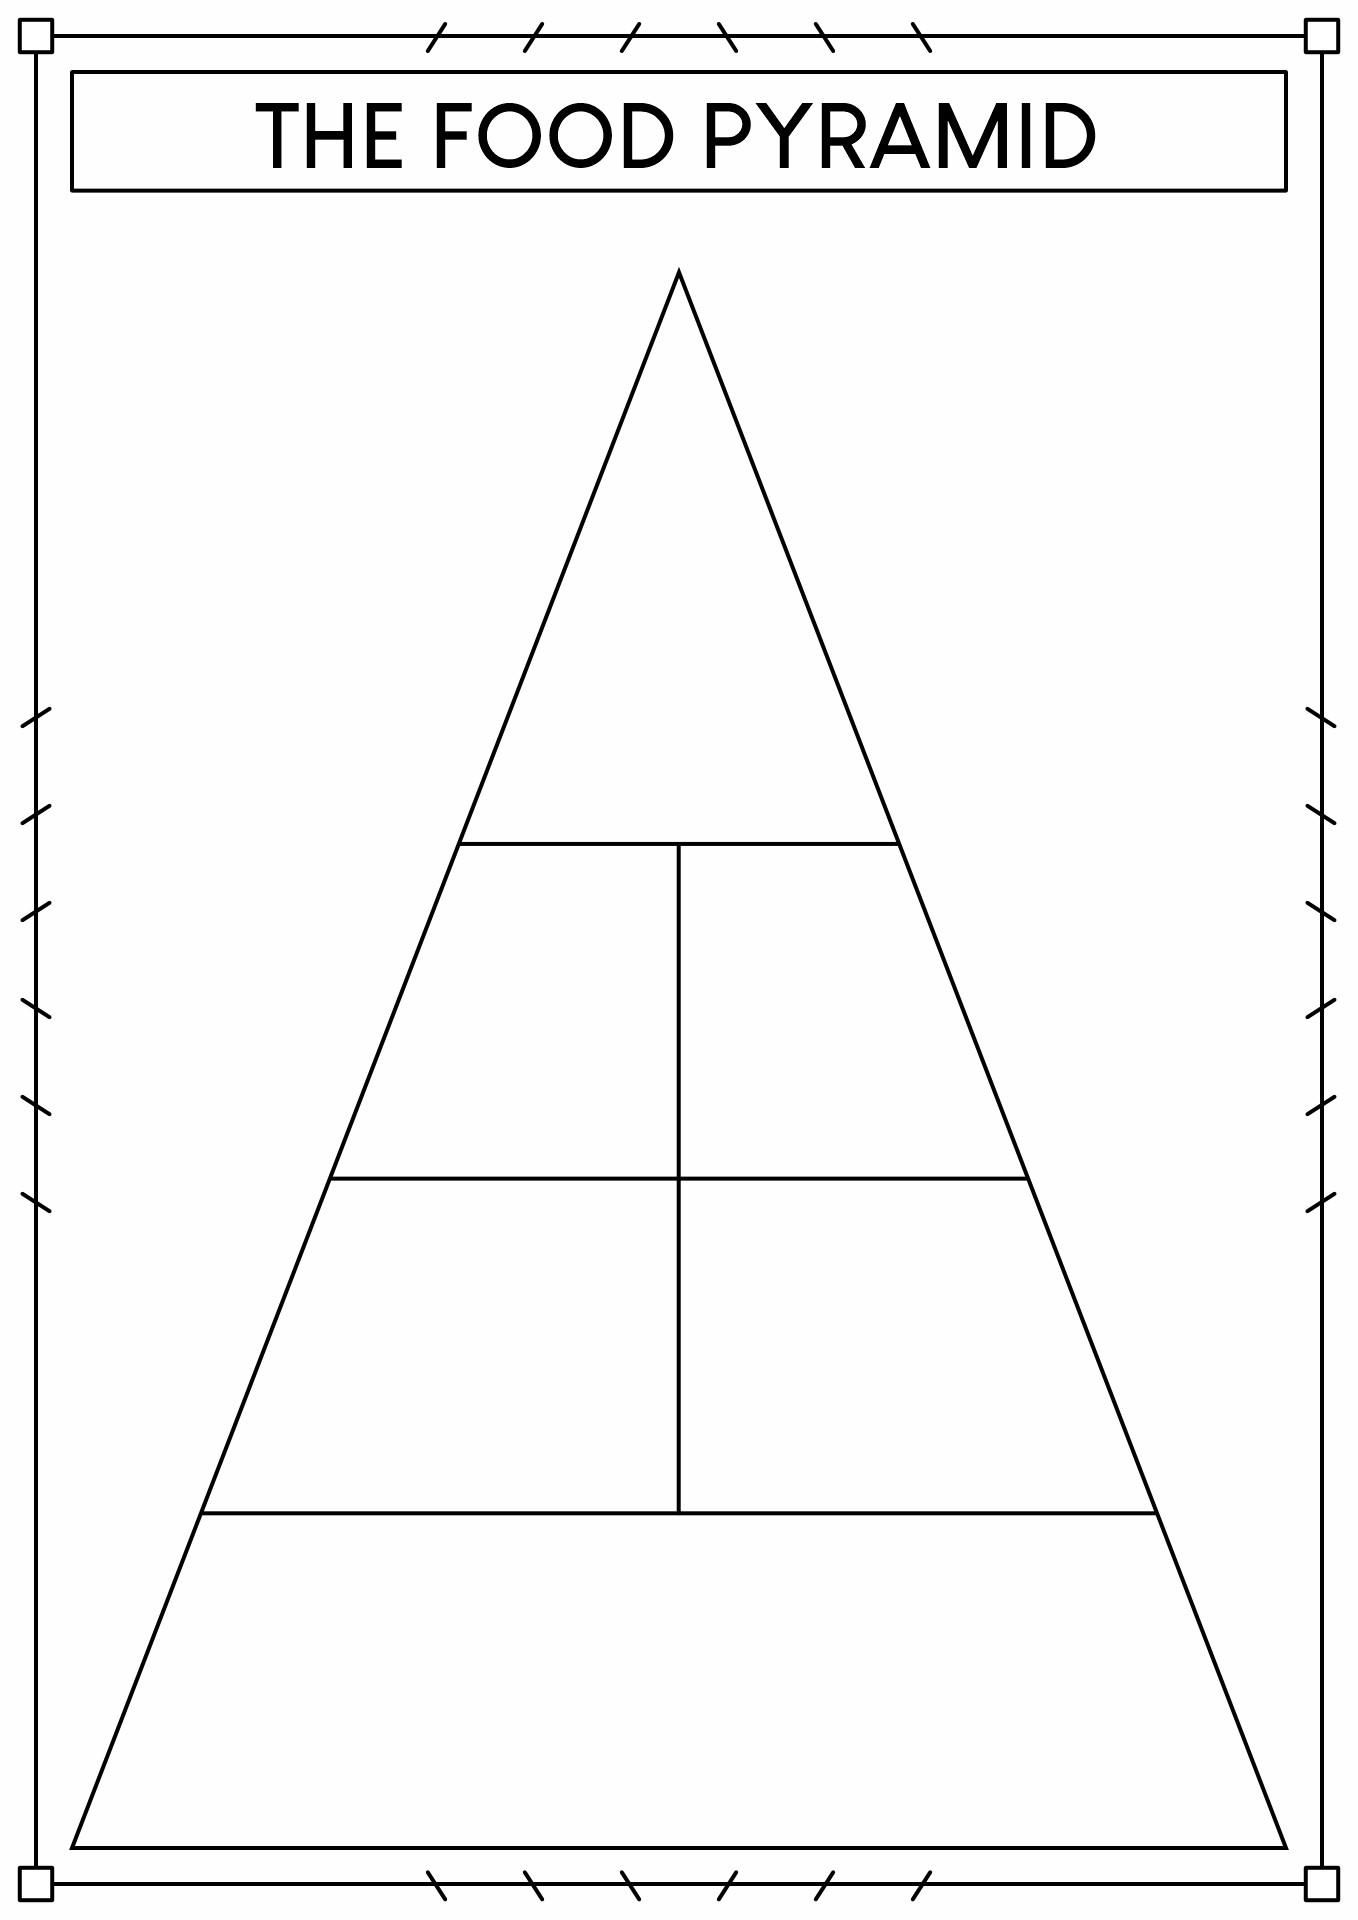 blank food plate diagram 2000 kia sephia engine pyramid christopherbathum co